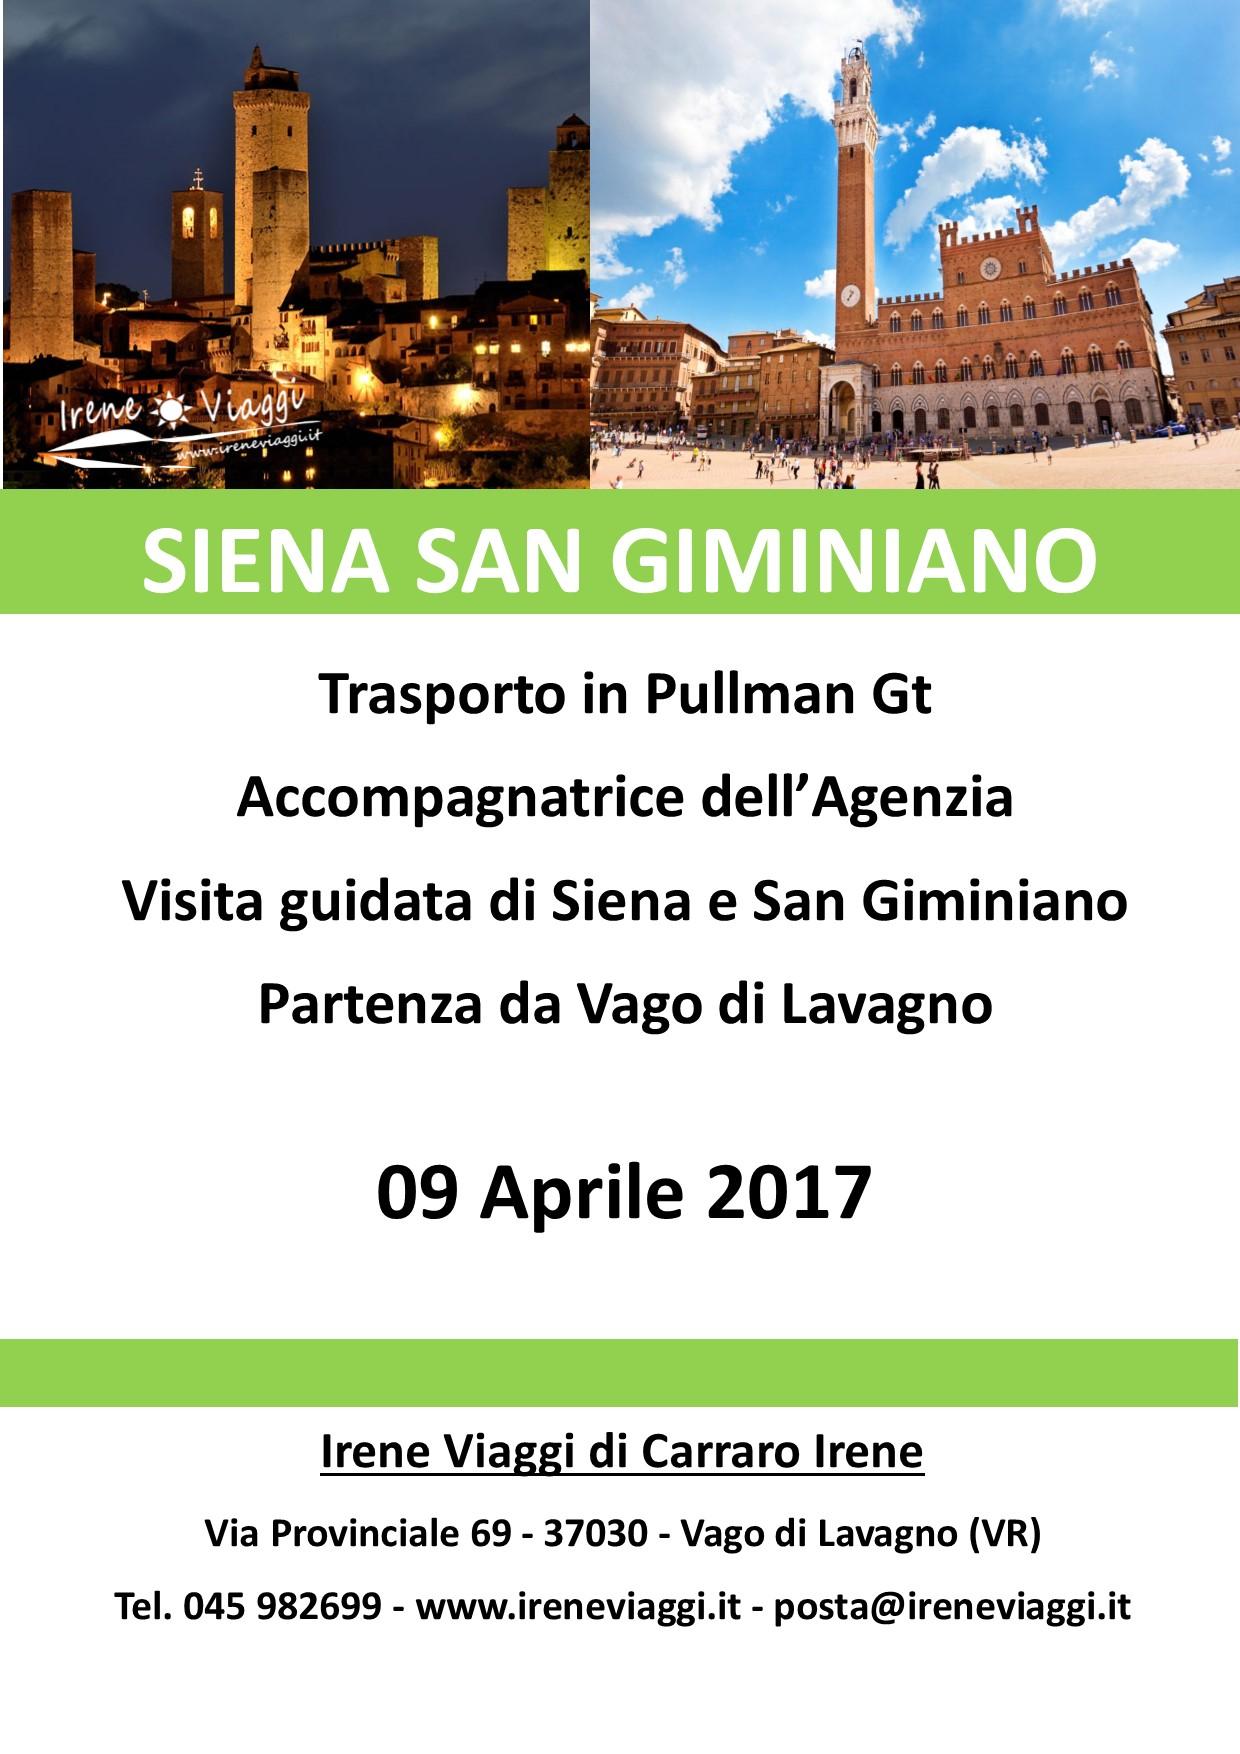 Siena e San Giminiano